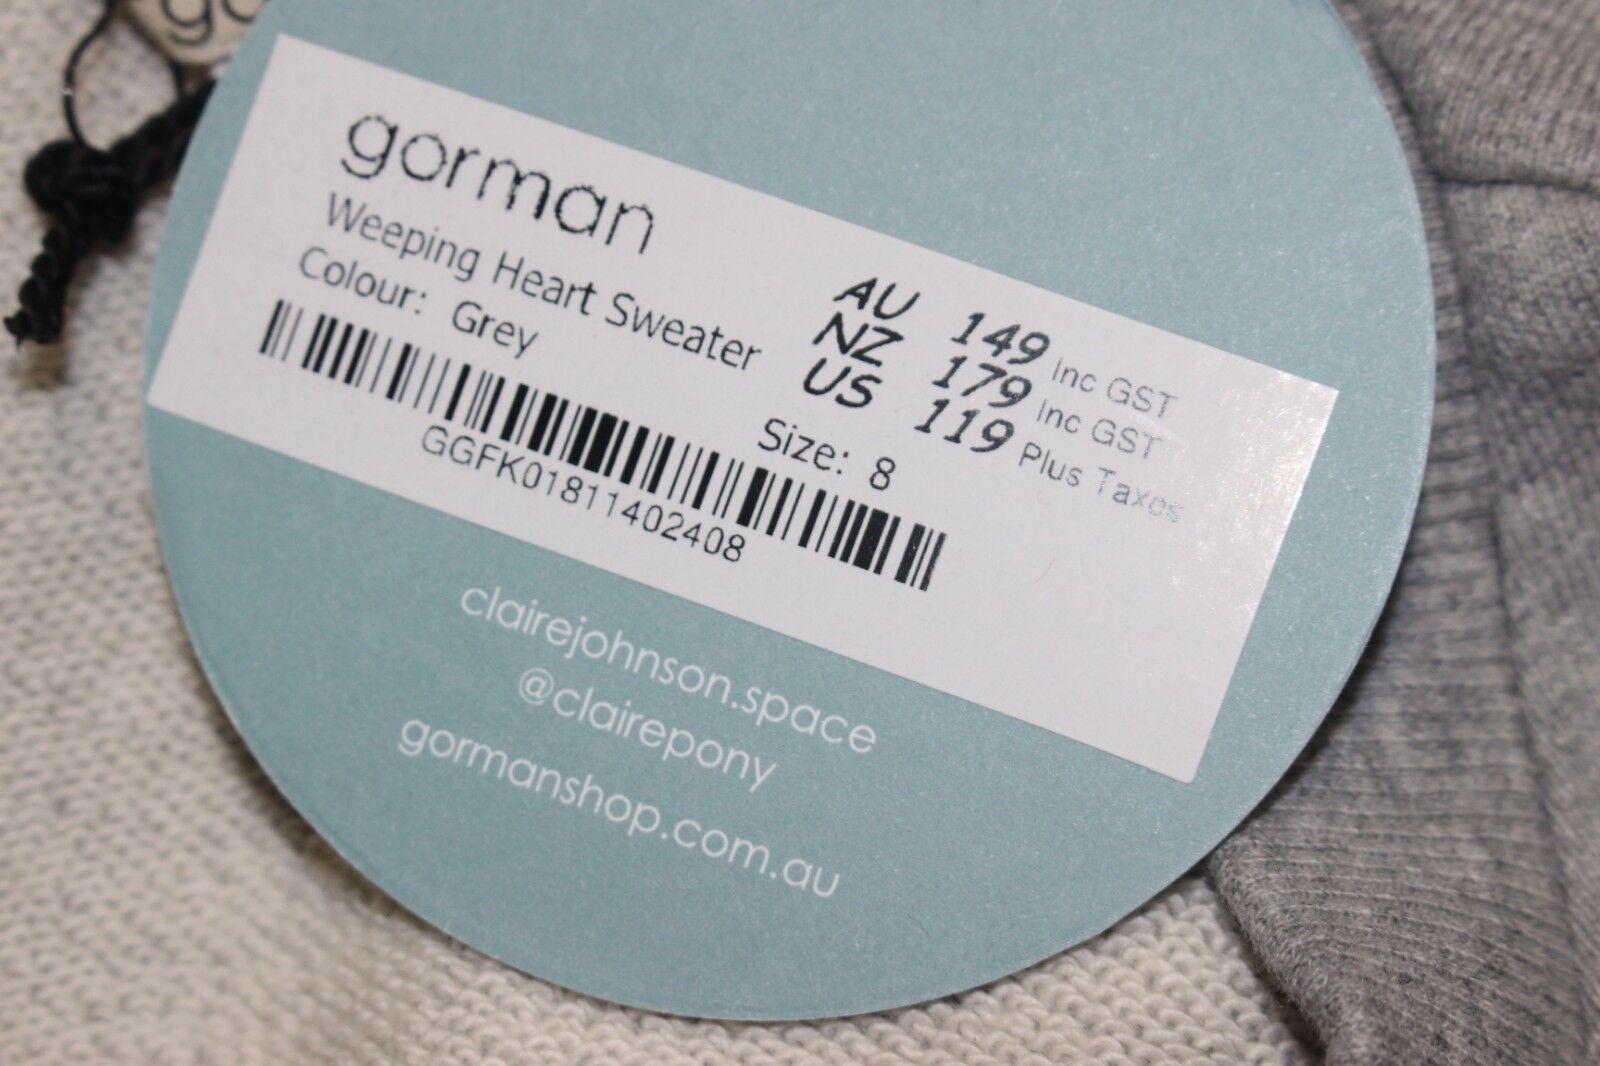 GORMAN GORMAN GORMAN CLAIRE JOHNSON WEEPING HEART SWEATER SWEATSHIRT US SIZE 4 GREY   149.00 604cad